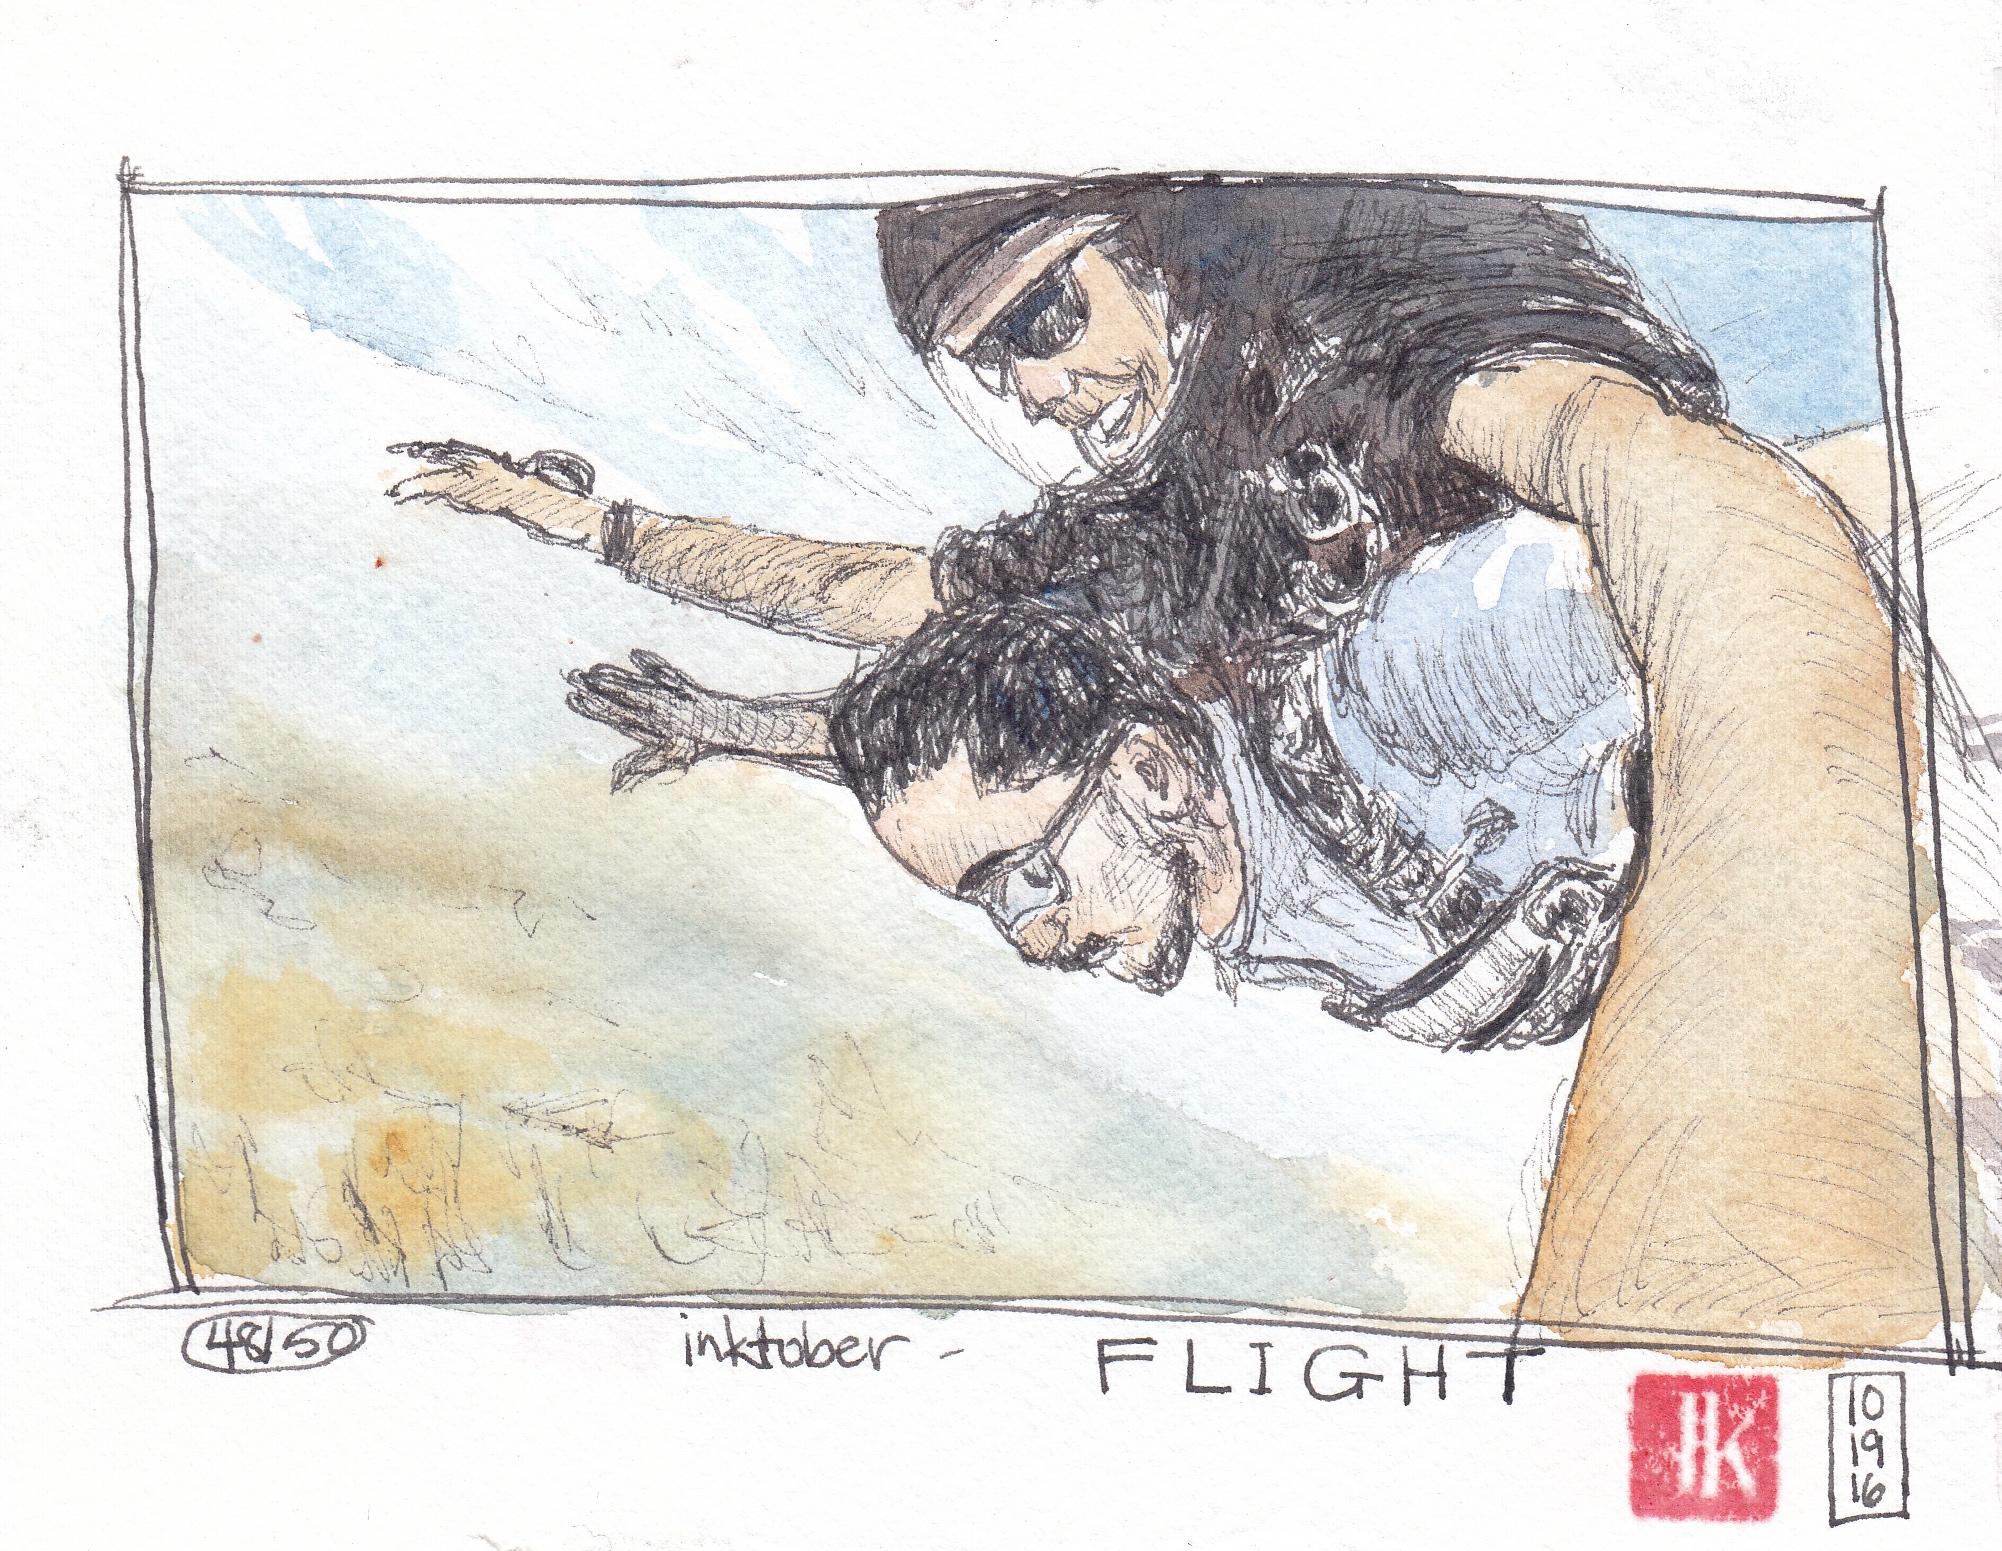 Day 19 - Flight